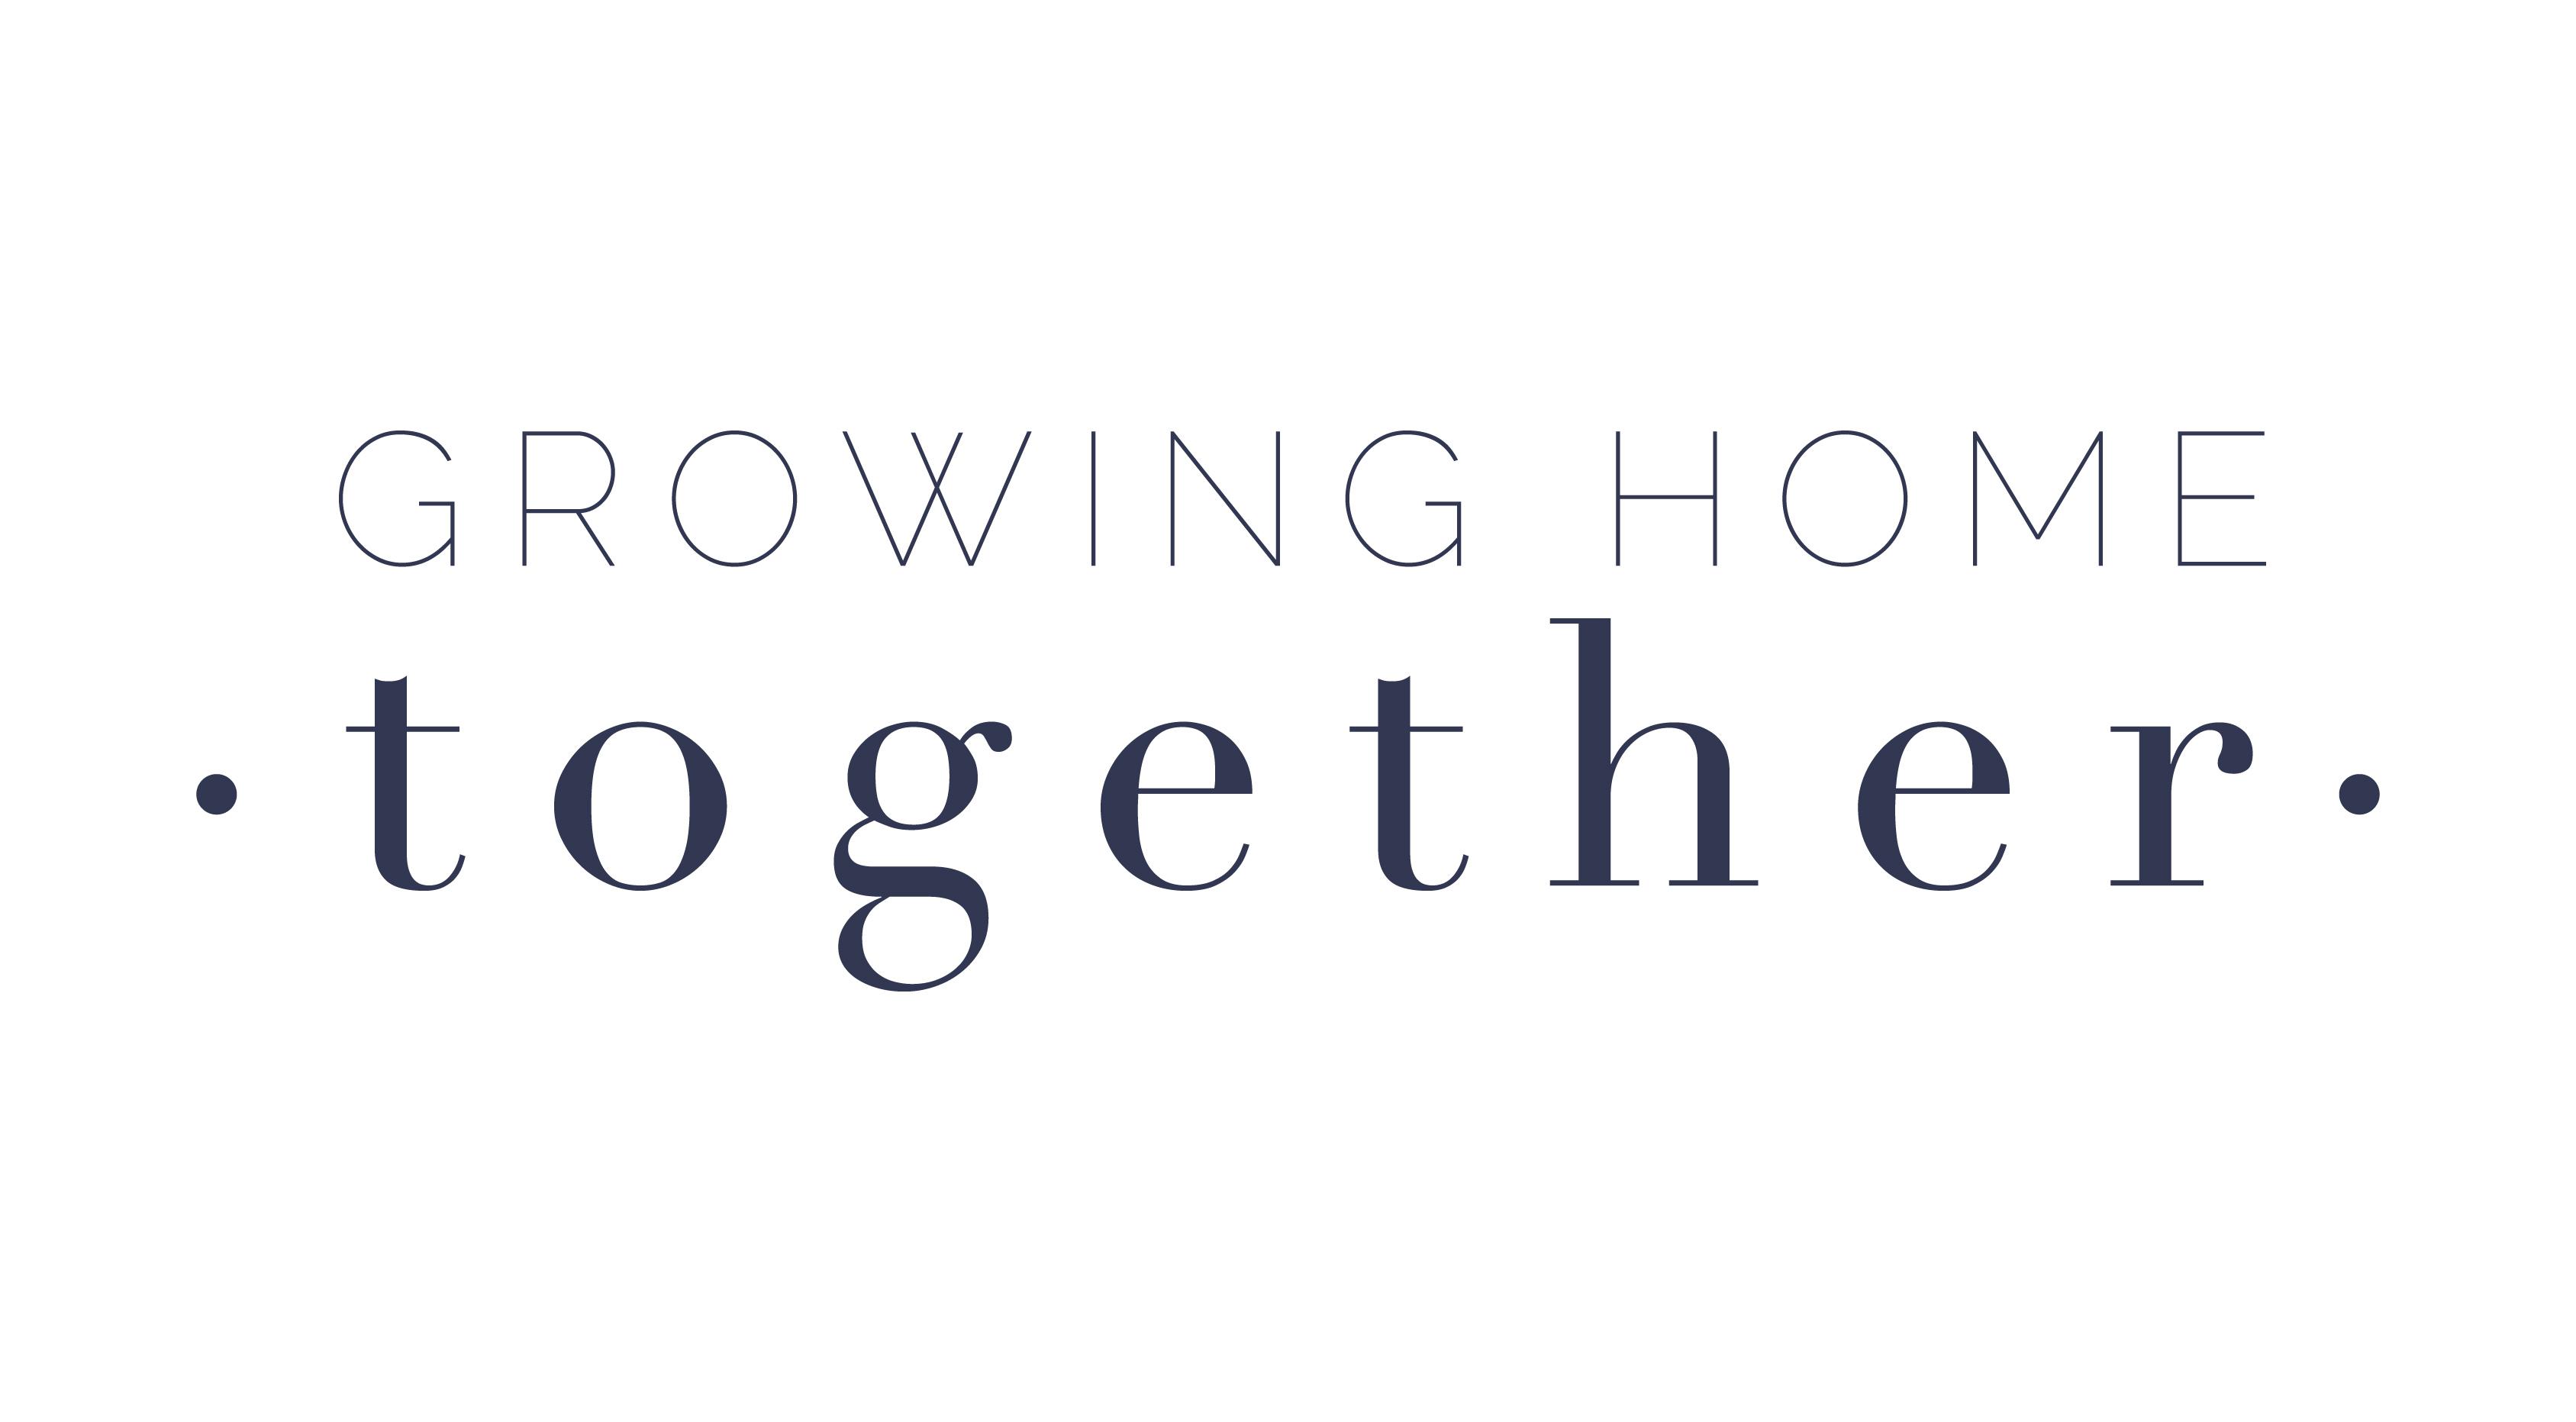 GrowingHomeTogether_logo_MAY17_MainColou